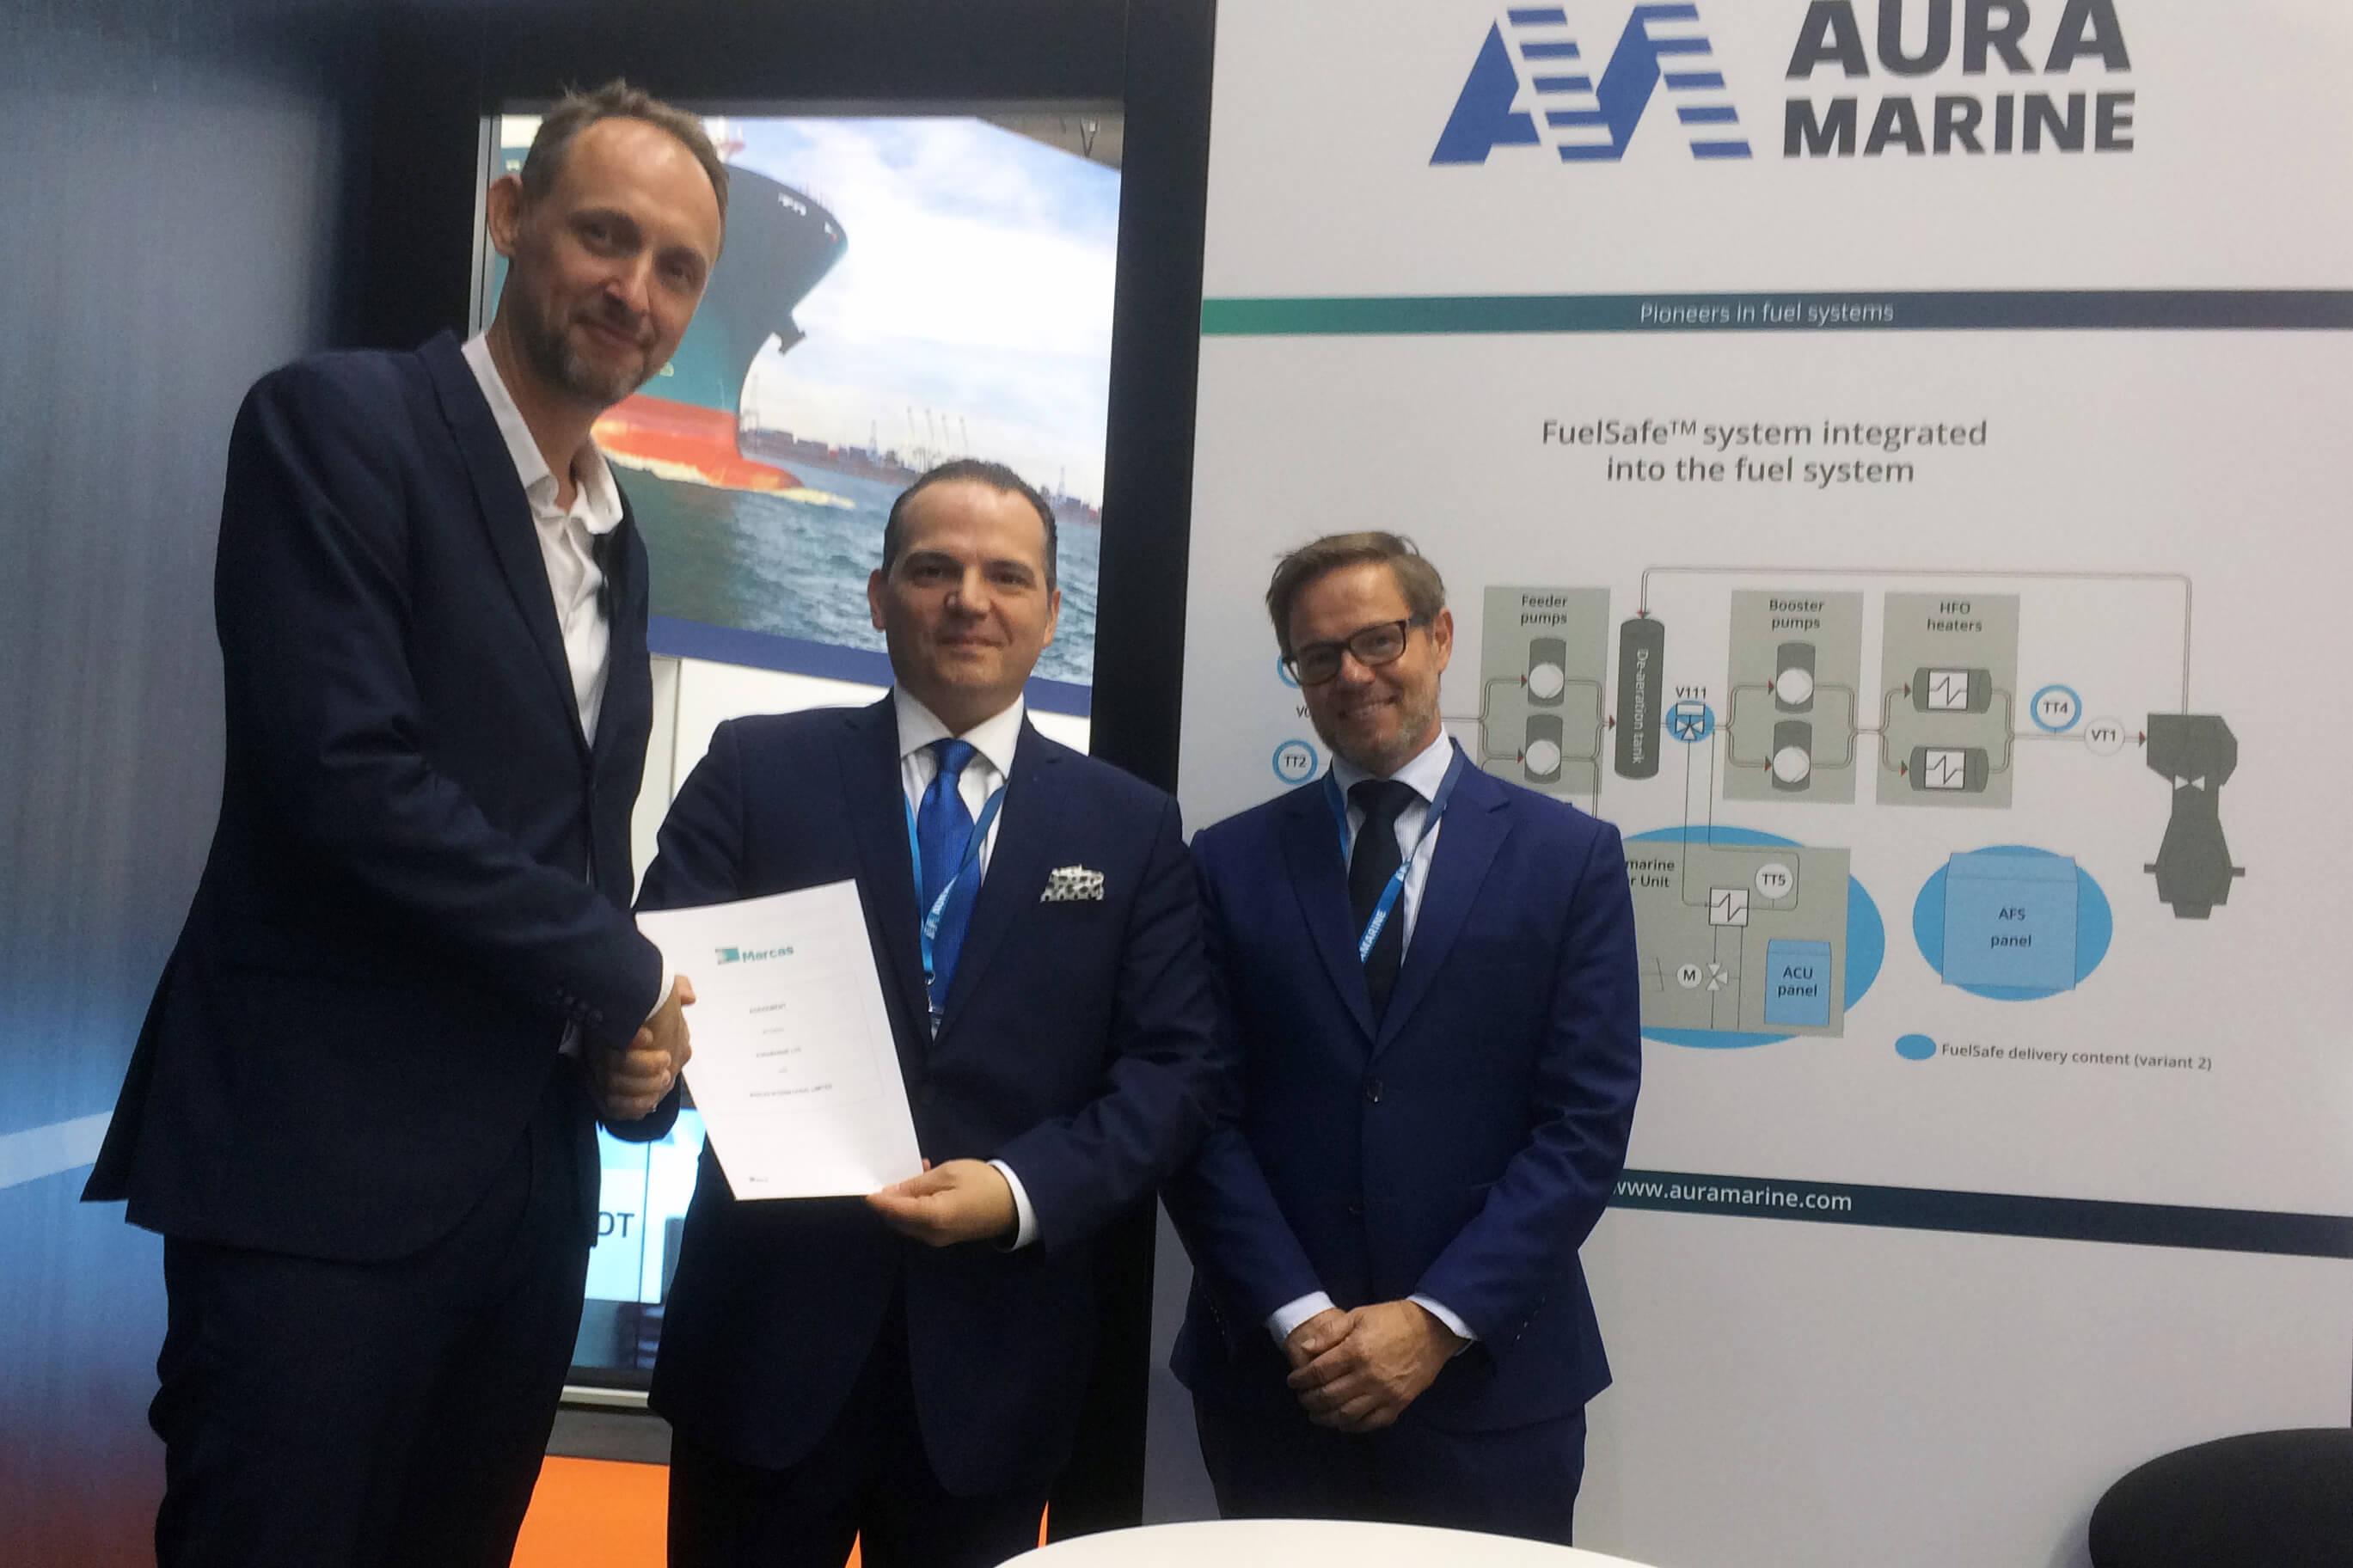 Jesper Bak Weller, Managing Director at MARCAS International Ltd; Konstantinos Fakiolas, Director Global After Sales at Auramarine; Ole Skatka Jensen, CEO at Auramarine